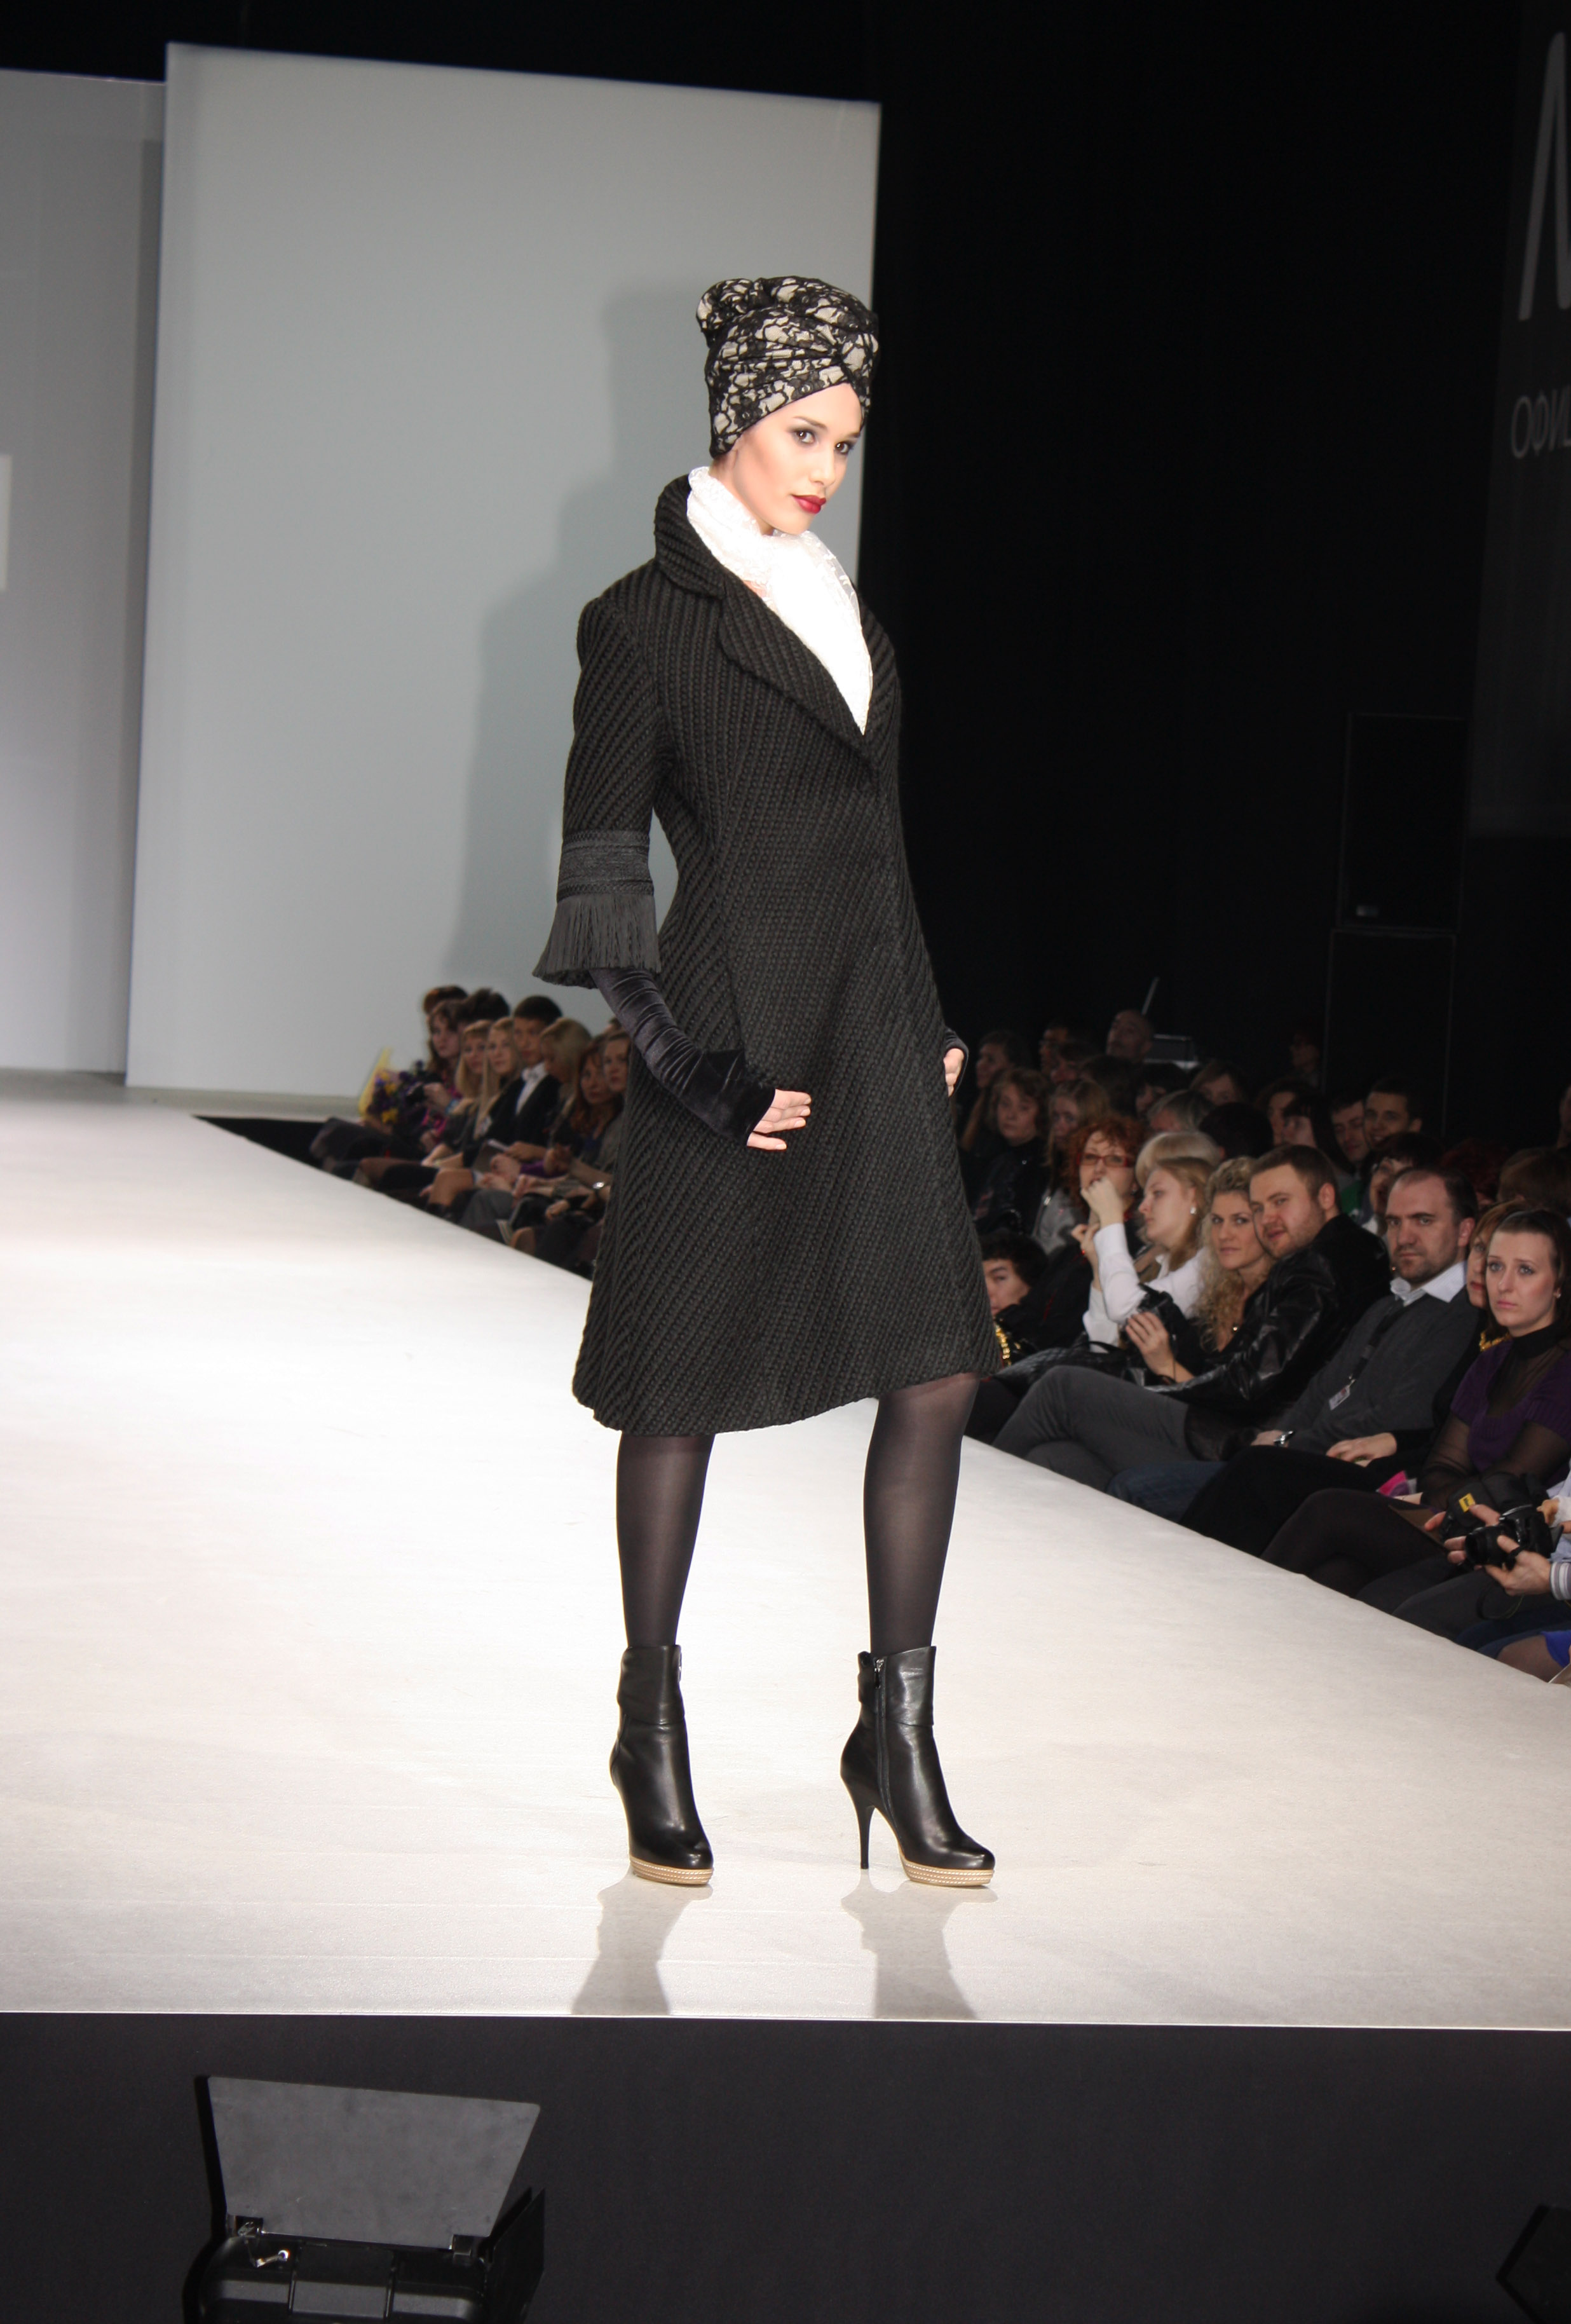 Показ коллекции Parisienne марки RUSTAM на Volvo Fashion week в 2019 году